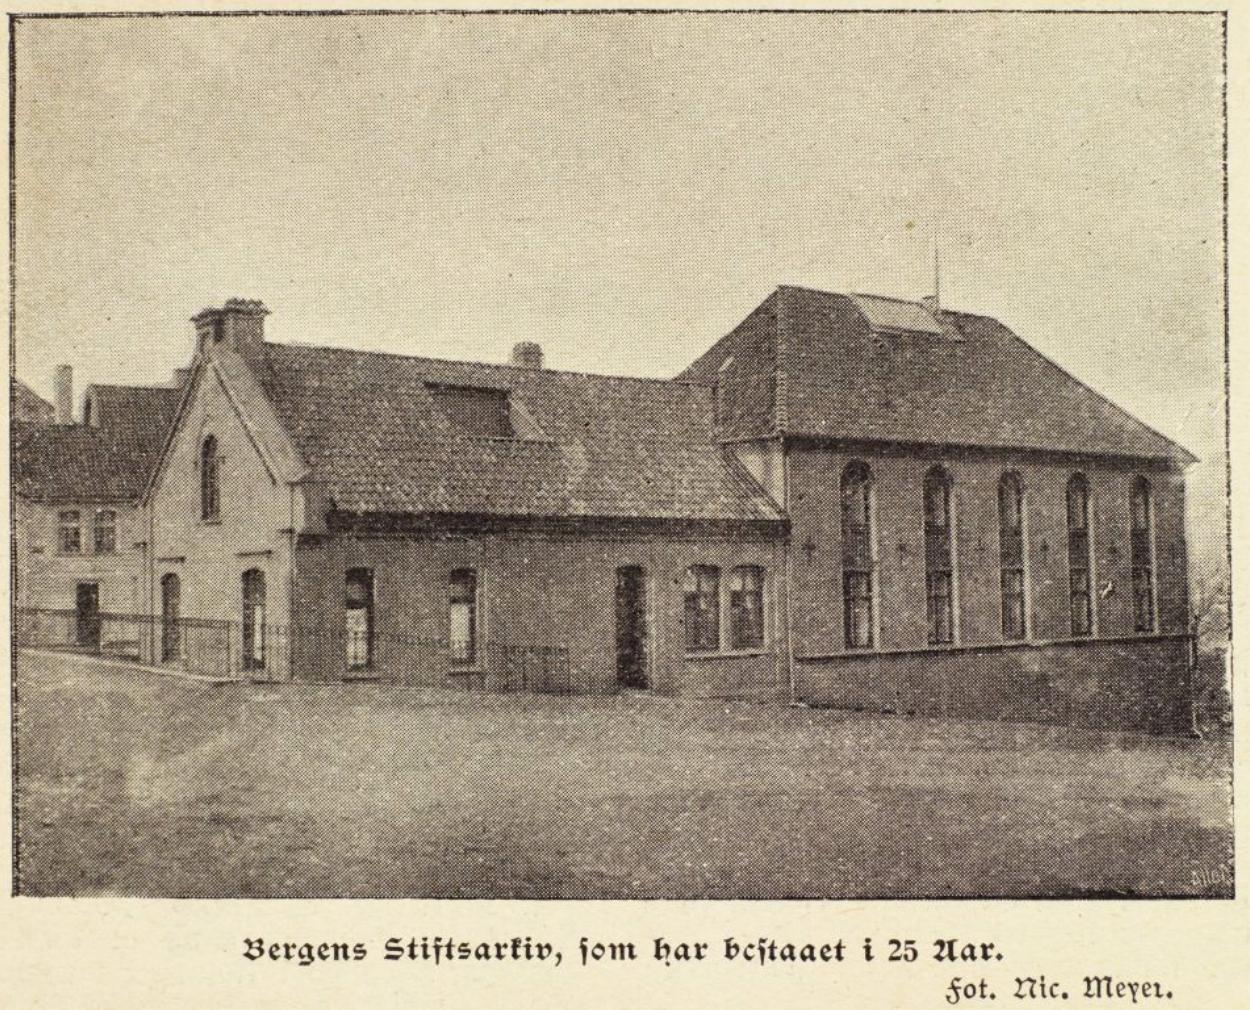 Bergens Stiftsarkiv i 1920. Foto: Uib billedsamlingen